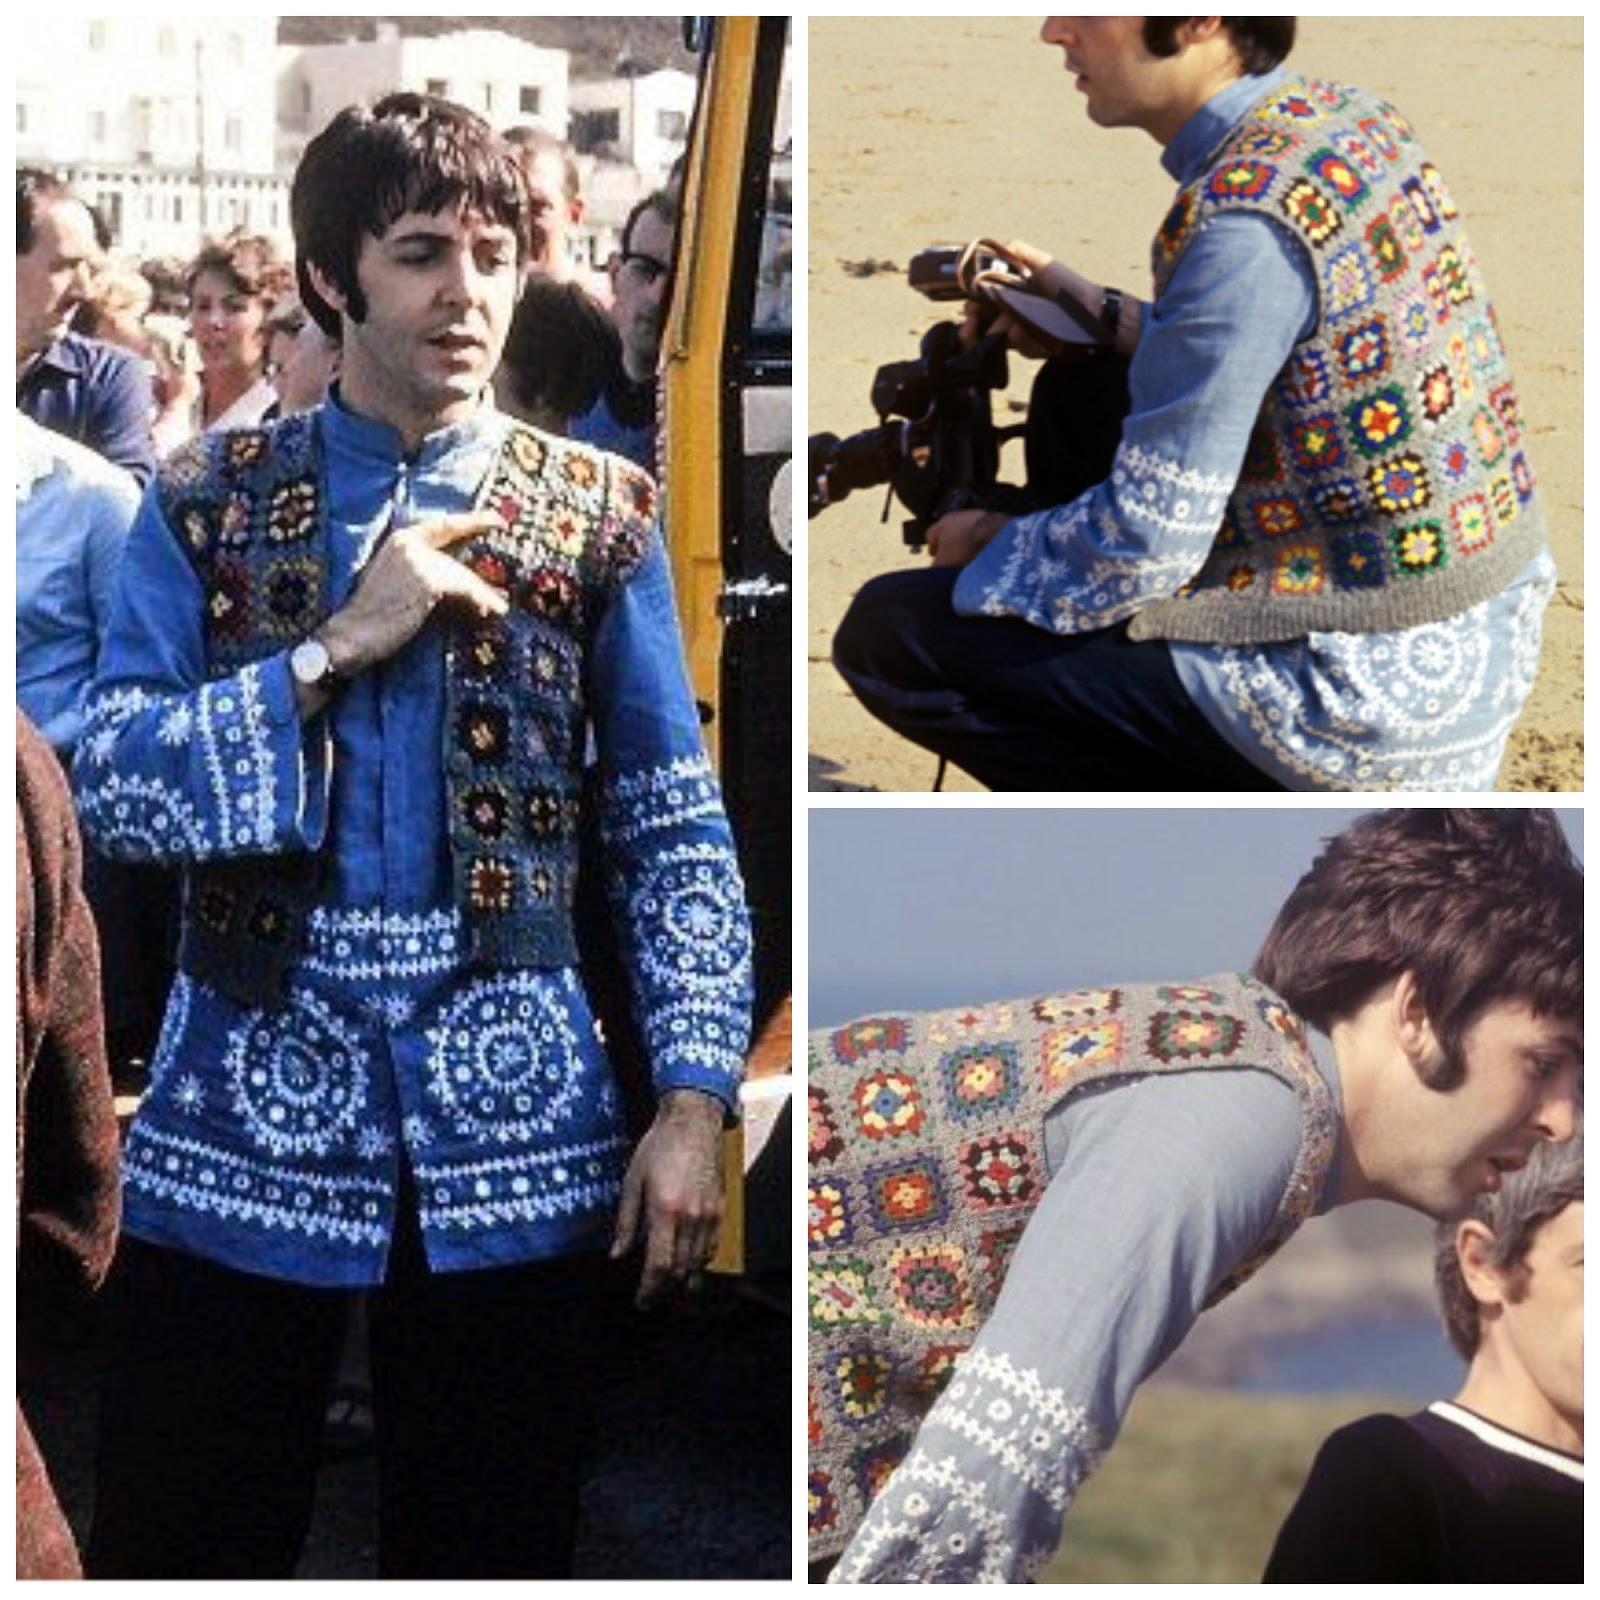 image of Paul McCartney's Crochet granny square waistcoat